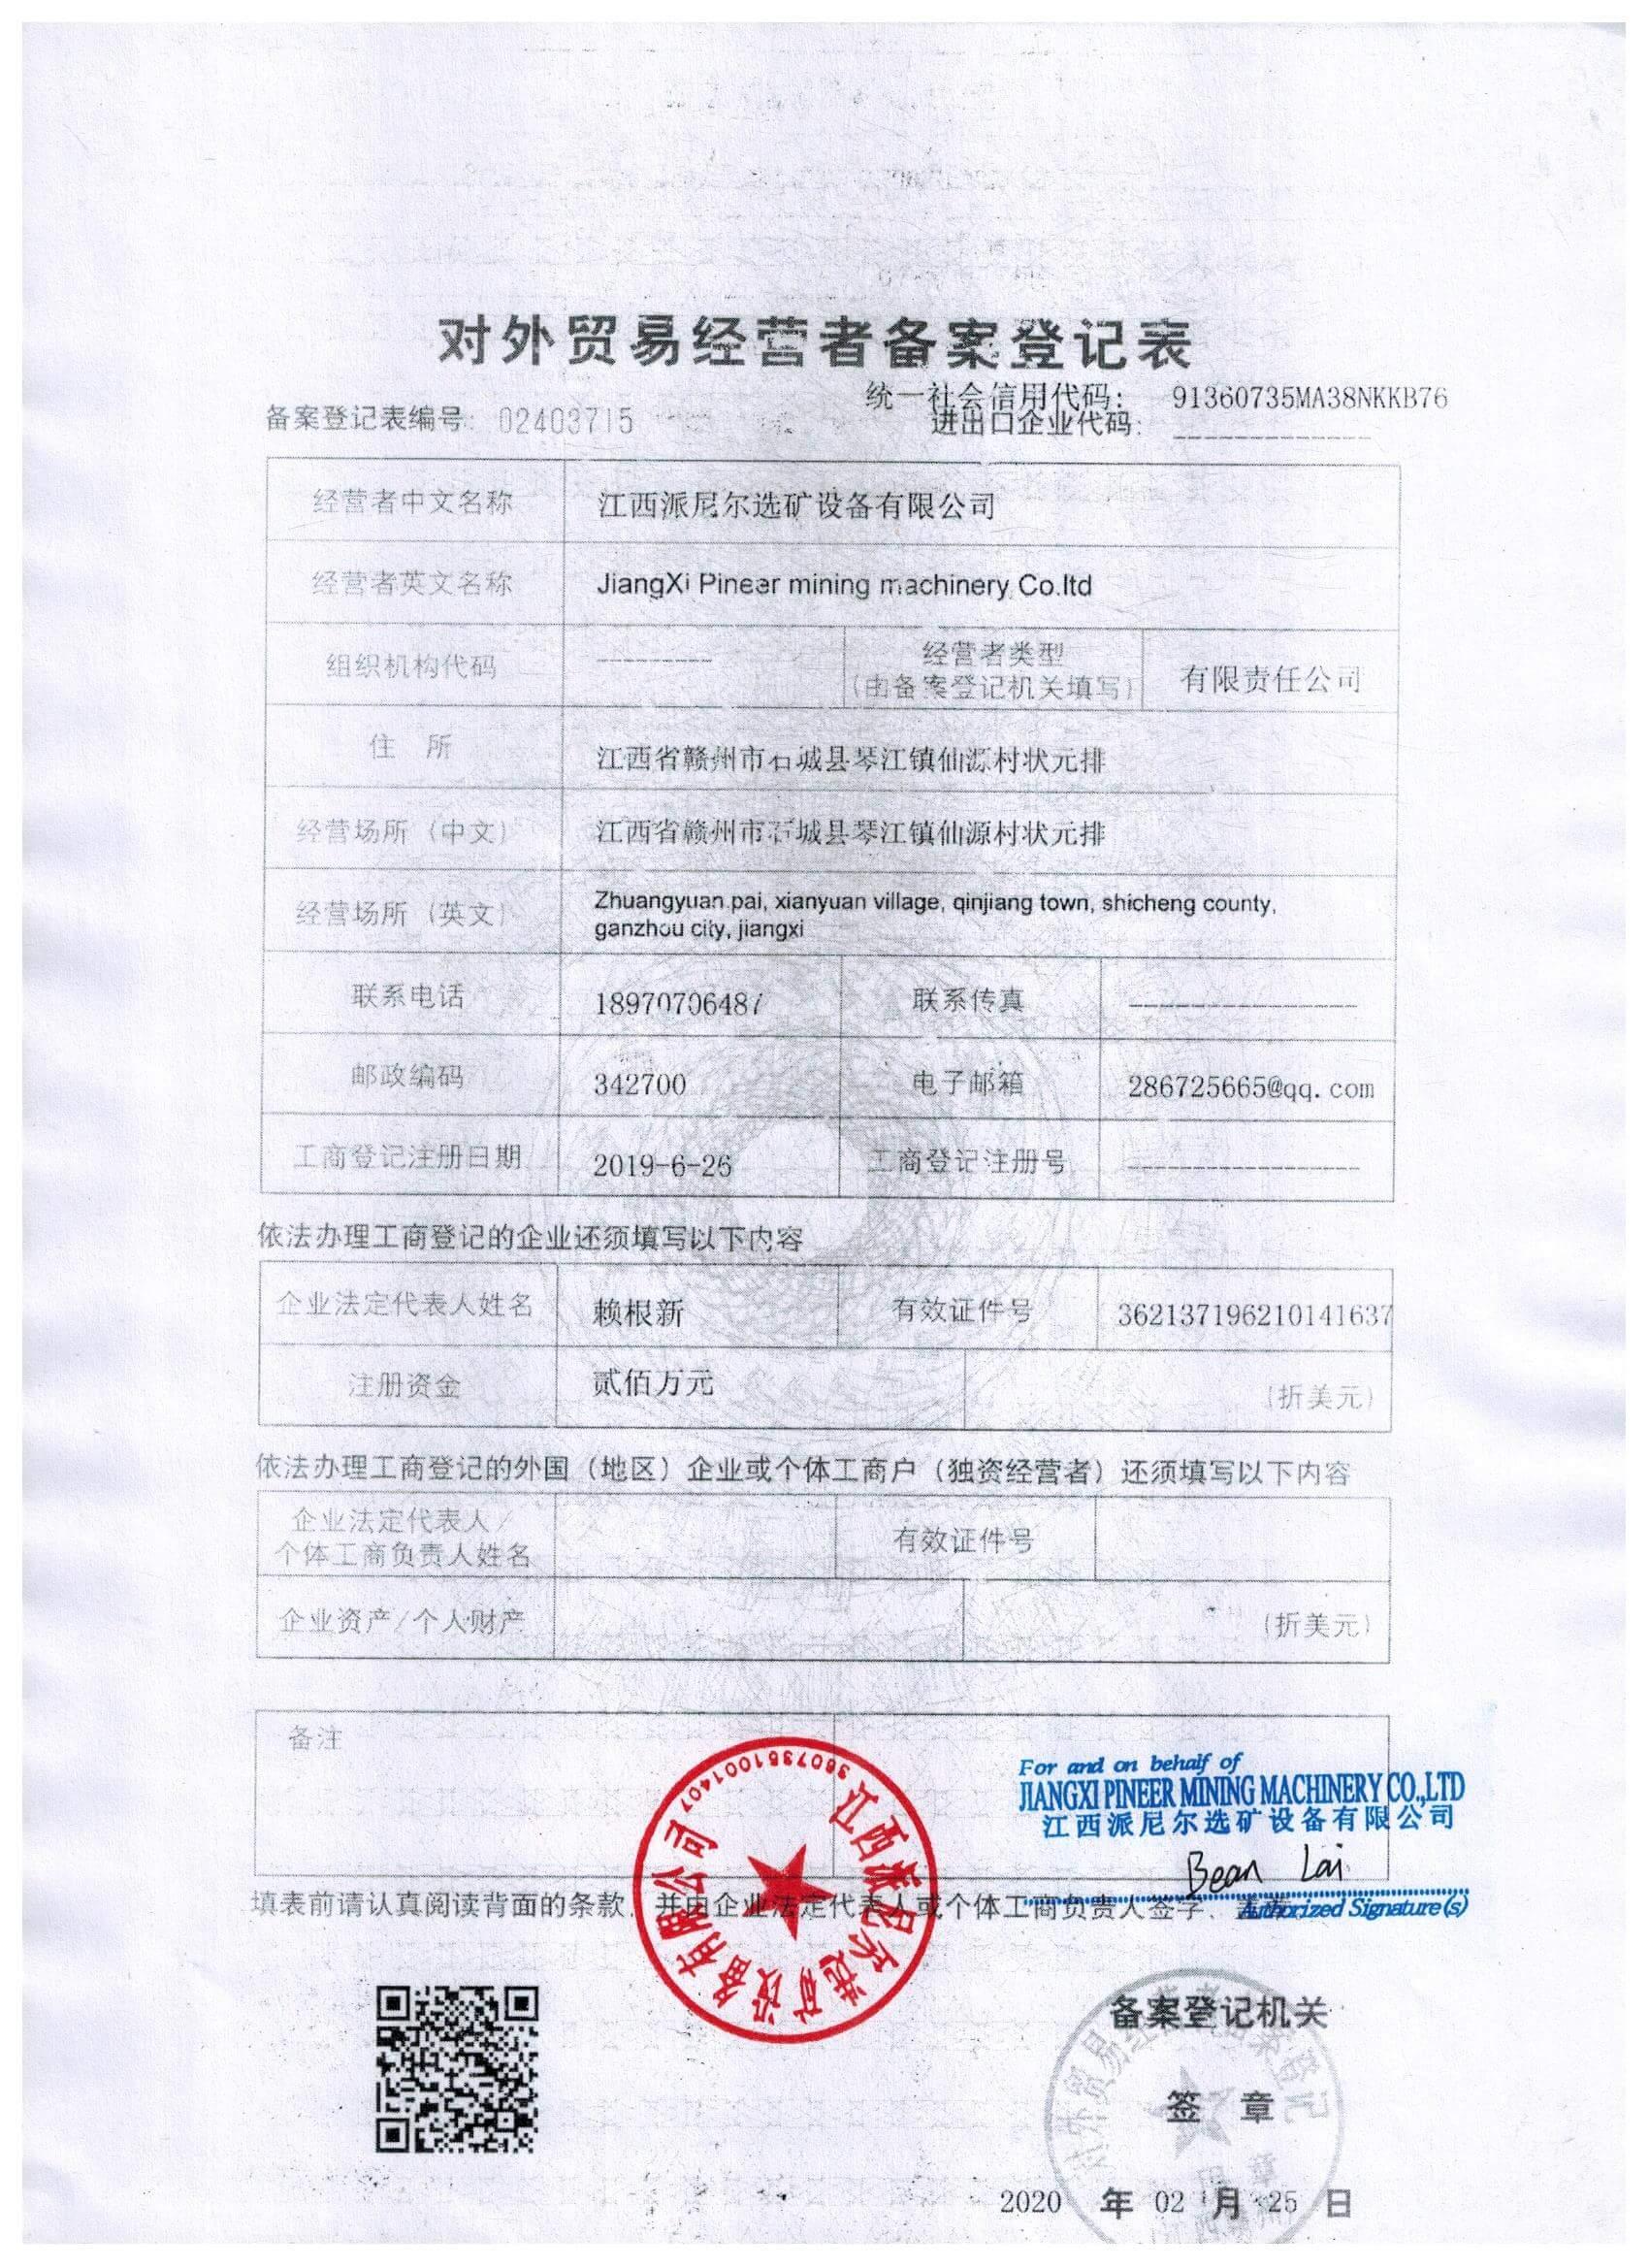 PINEER COMPANY IMPORT&EXPORT LISENCE -file